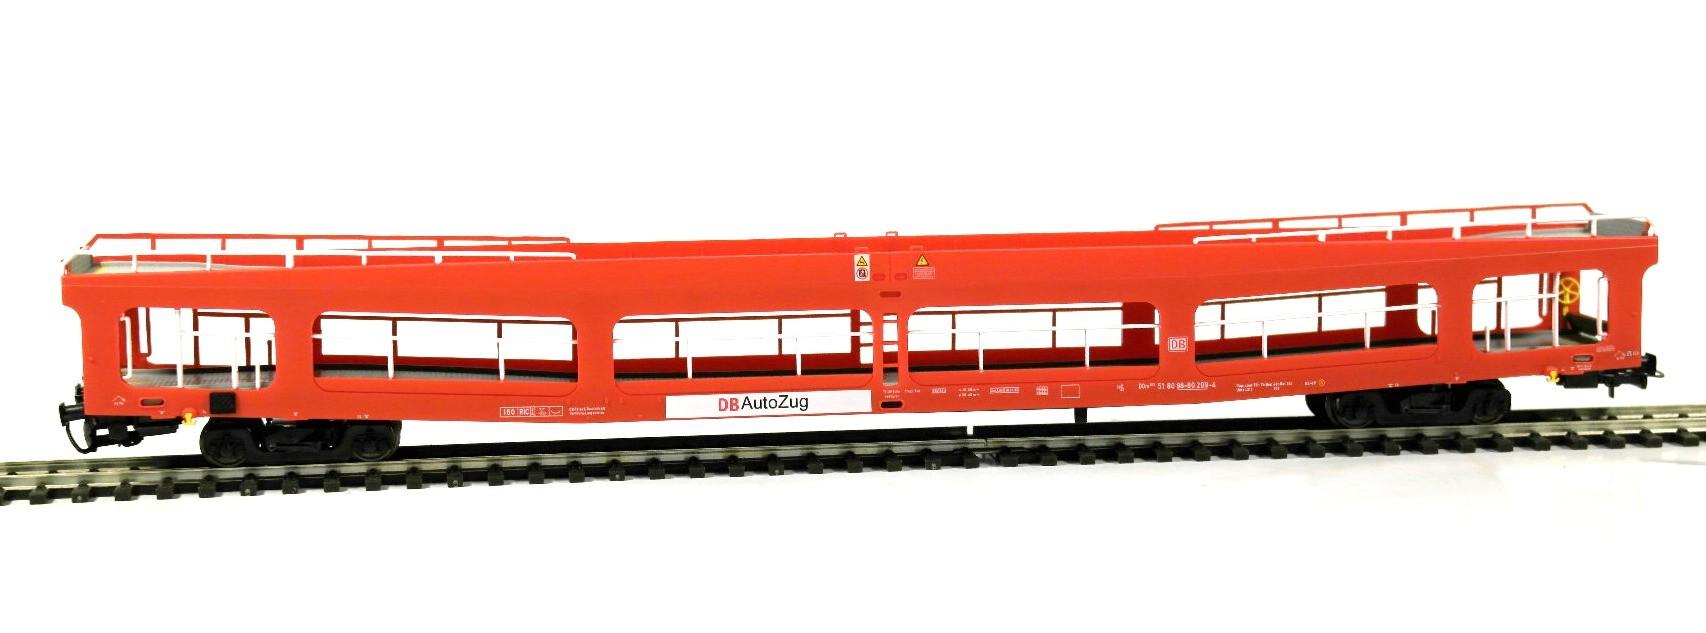 Heris 11079 - DDm 916, Autotransporter, ex DR, DB AutoZug, rot